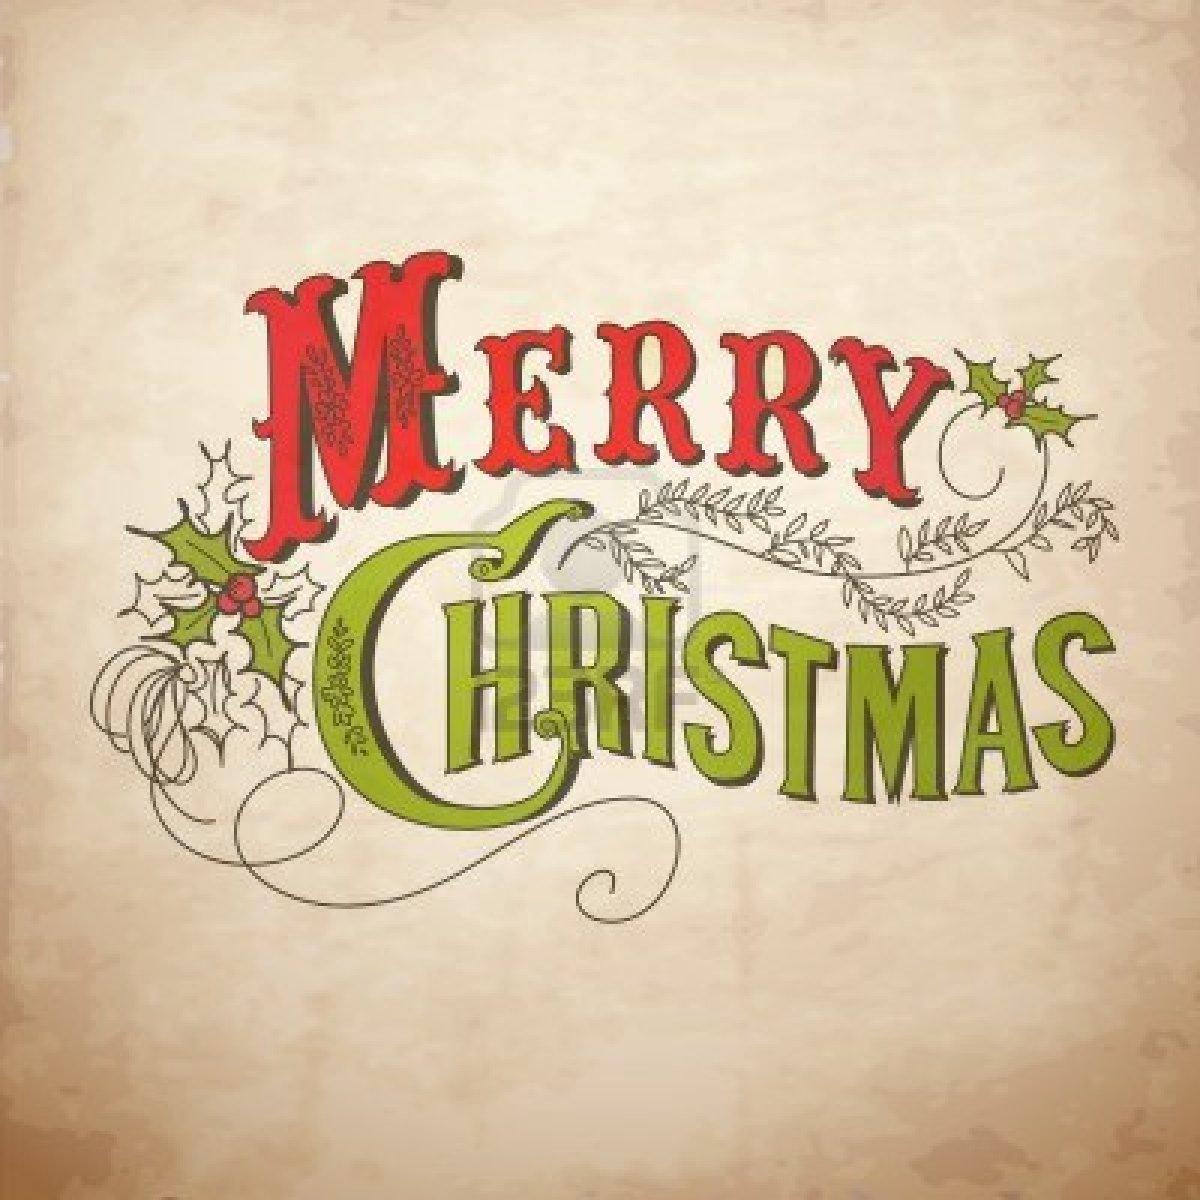 11158899-vintage-christmas-card-merry-christmas-lettering.jpg